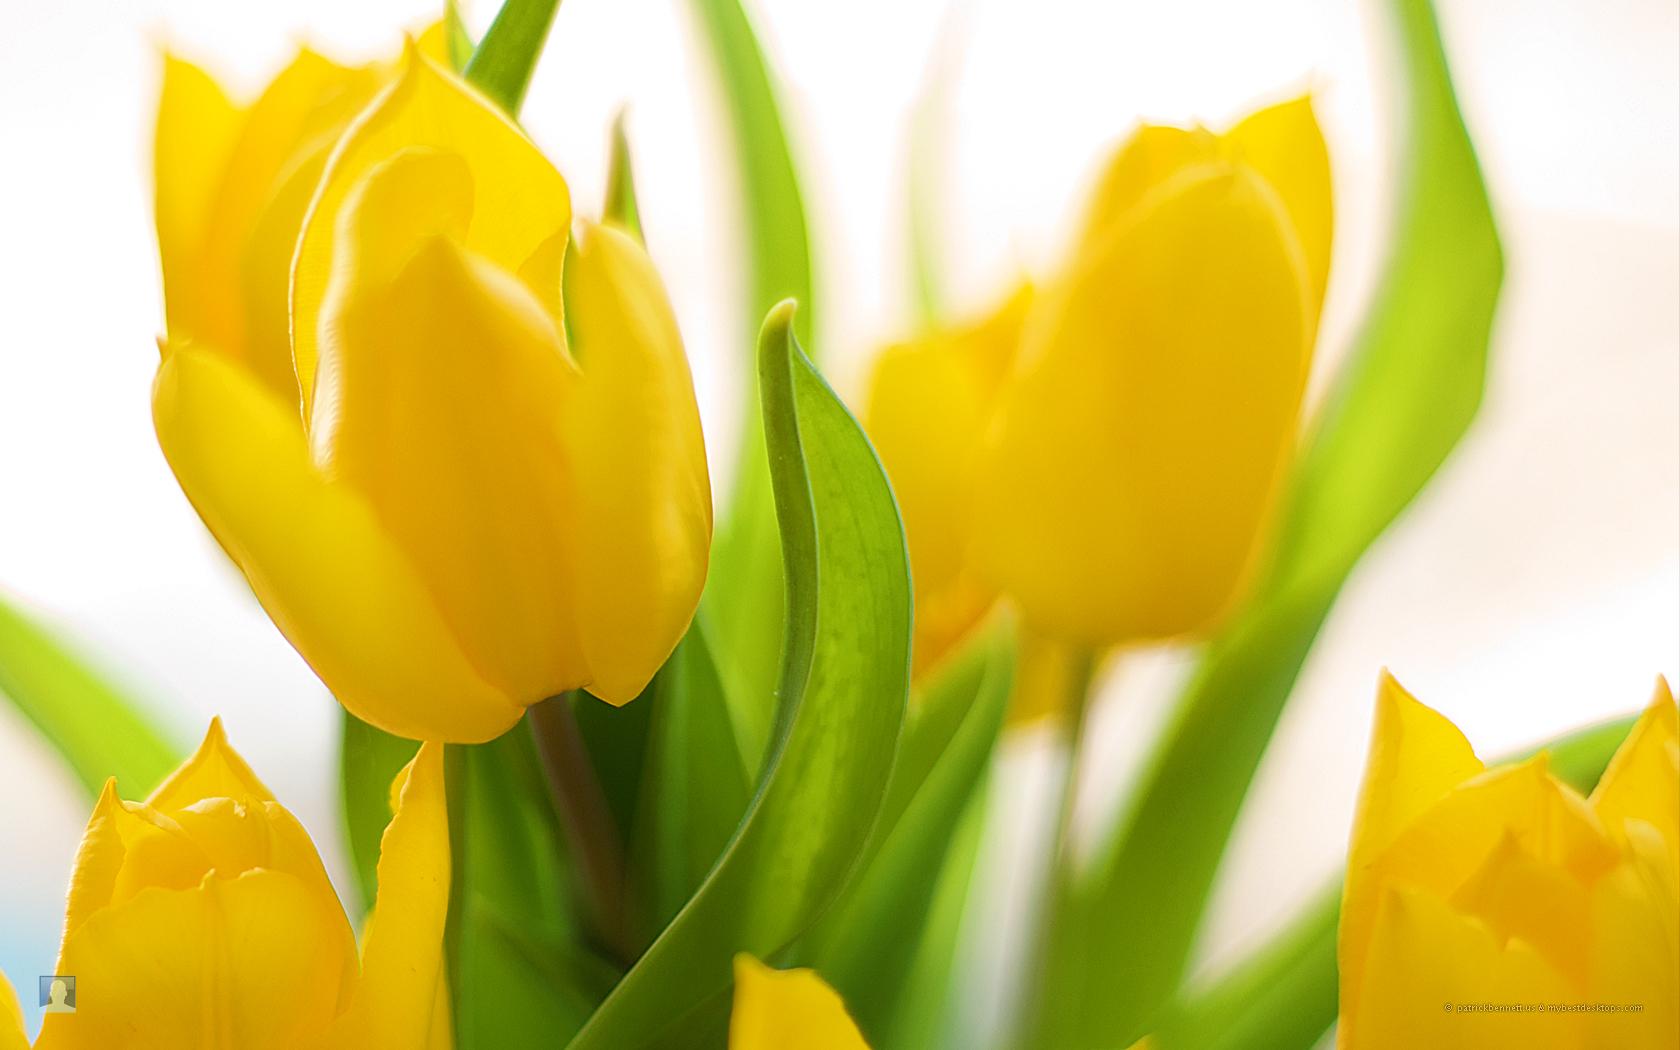 Spring flowers india prashant mendiratta spring gardeners and flower lovers often overlook spring flowers 1 mightylinksfo